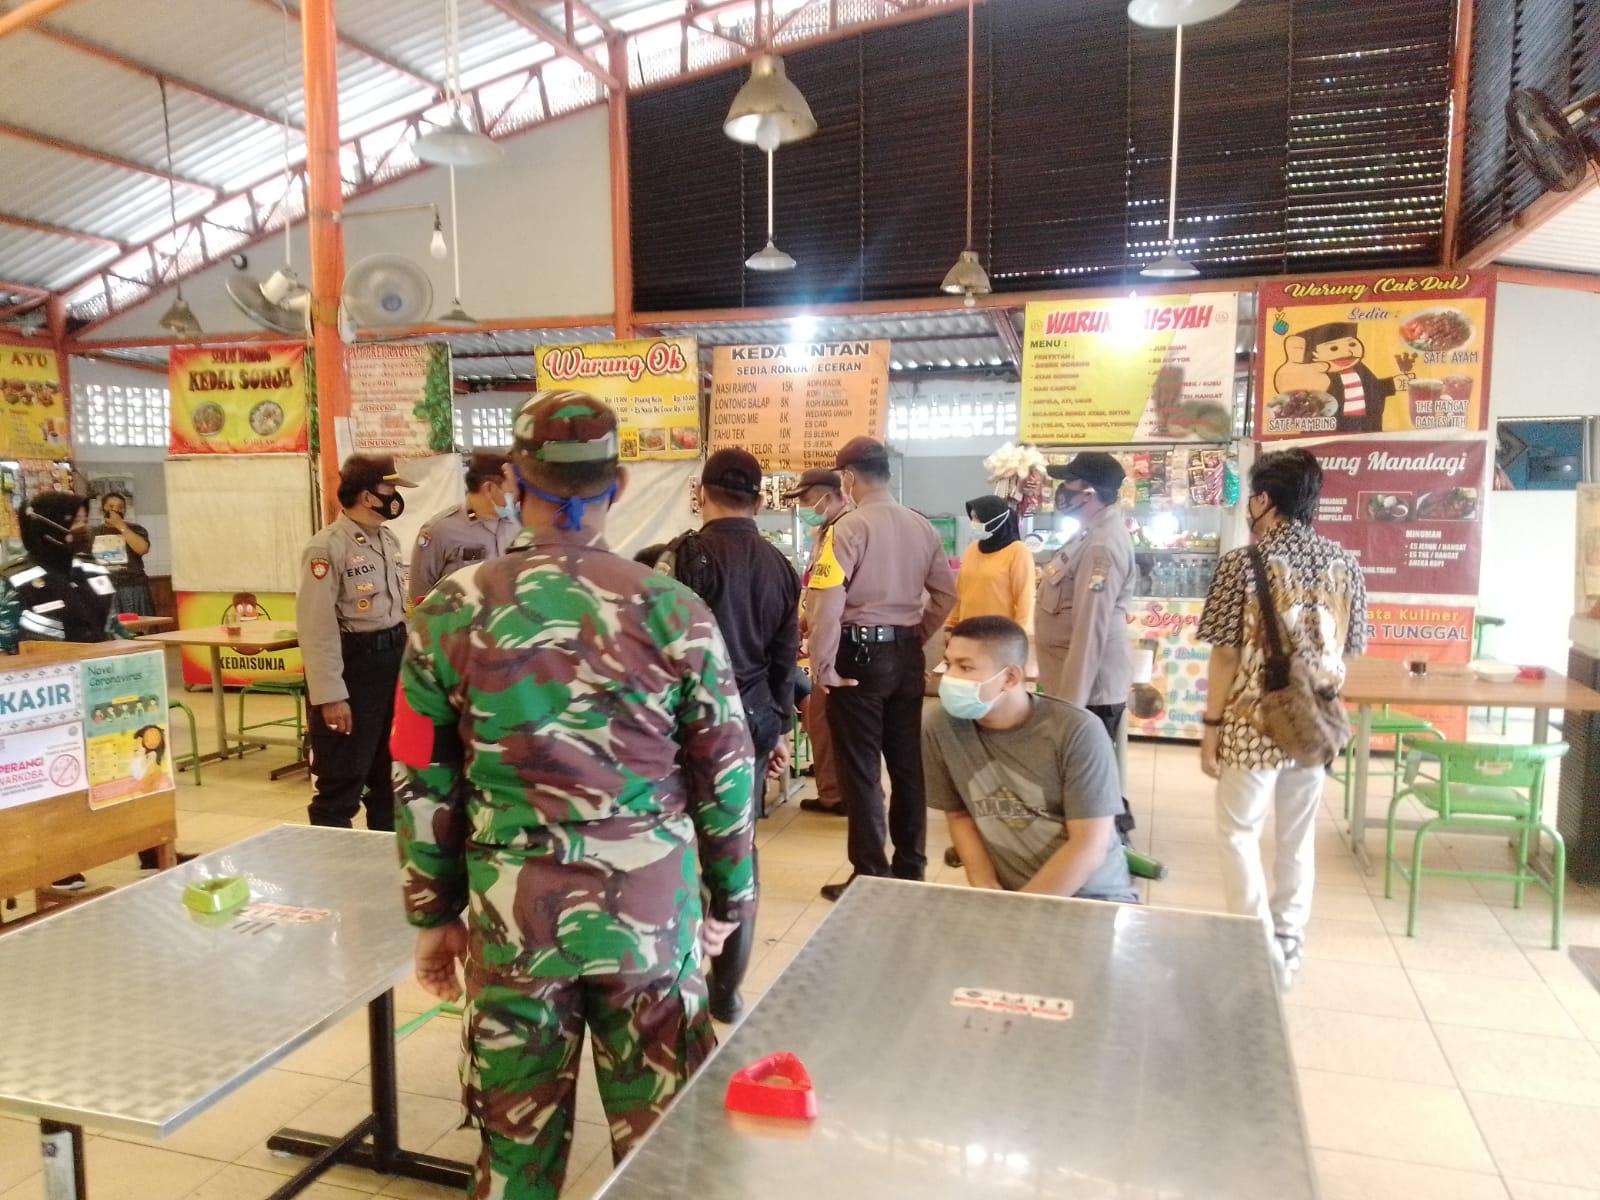 Tim Gabungan dari tiga pilar meliputi Kecamatan Wiyung, Polsek Wiyung, Koramil Wiyung, Satpol-PP Wiyung dan jajaran melakukan inspeksi mendadak (sidak) operasi yustisi di Sentra Kuliner Jajartunggal, Surabaya, Jumat (05/02/2021), pukul 10.00 WIB. (Foto: Rangga Aji/Tugu Jatim)